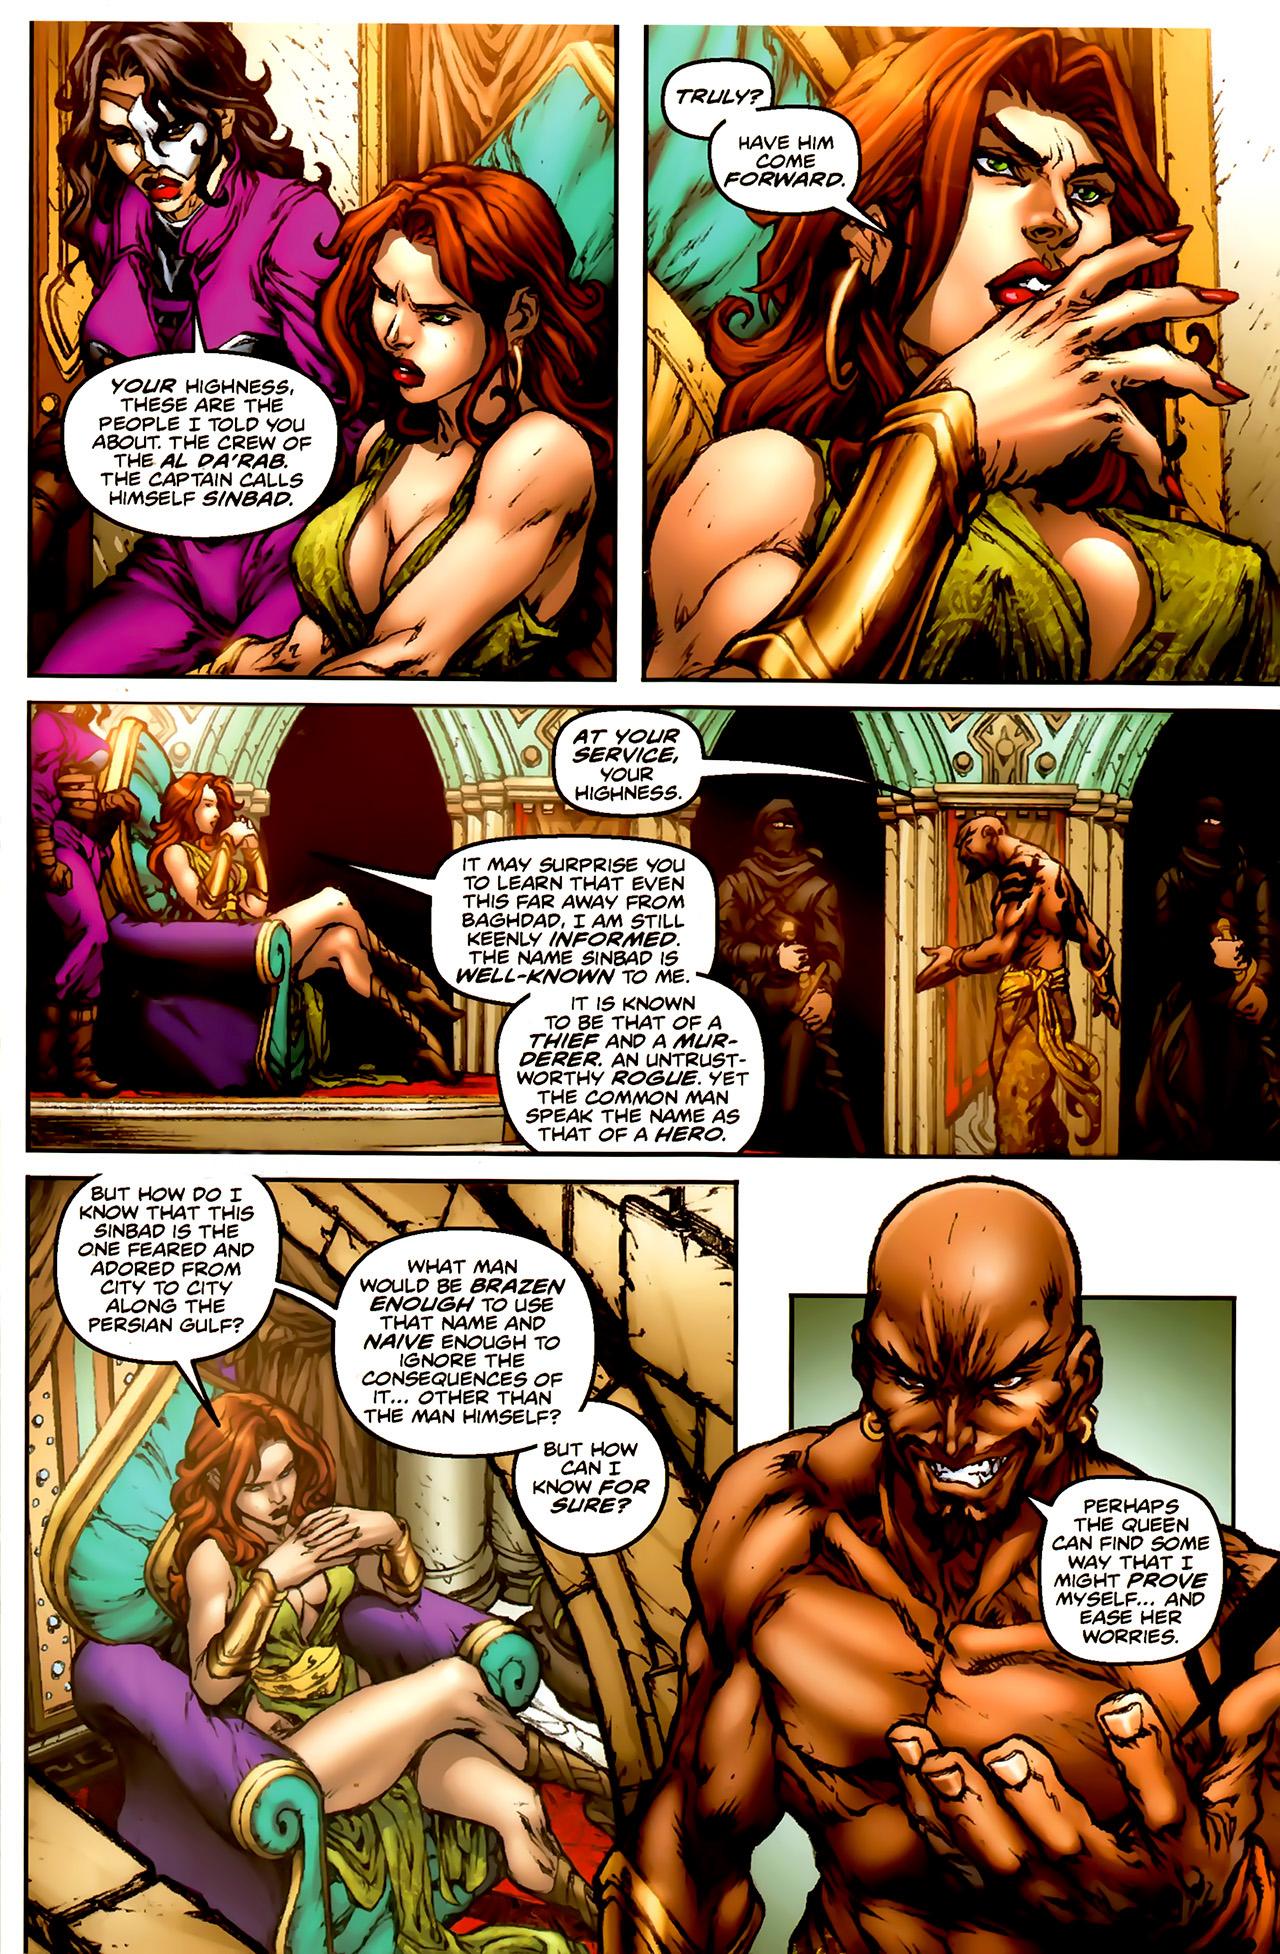 Read online 1001 Arabian Nights: The Adventures of Sinbad comic -  Issue #1 - 19